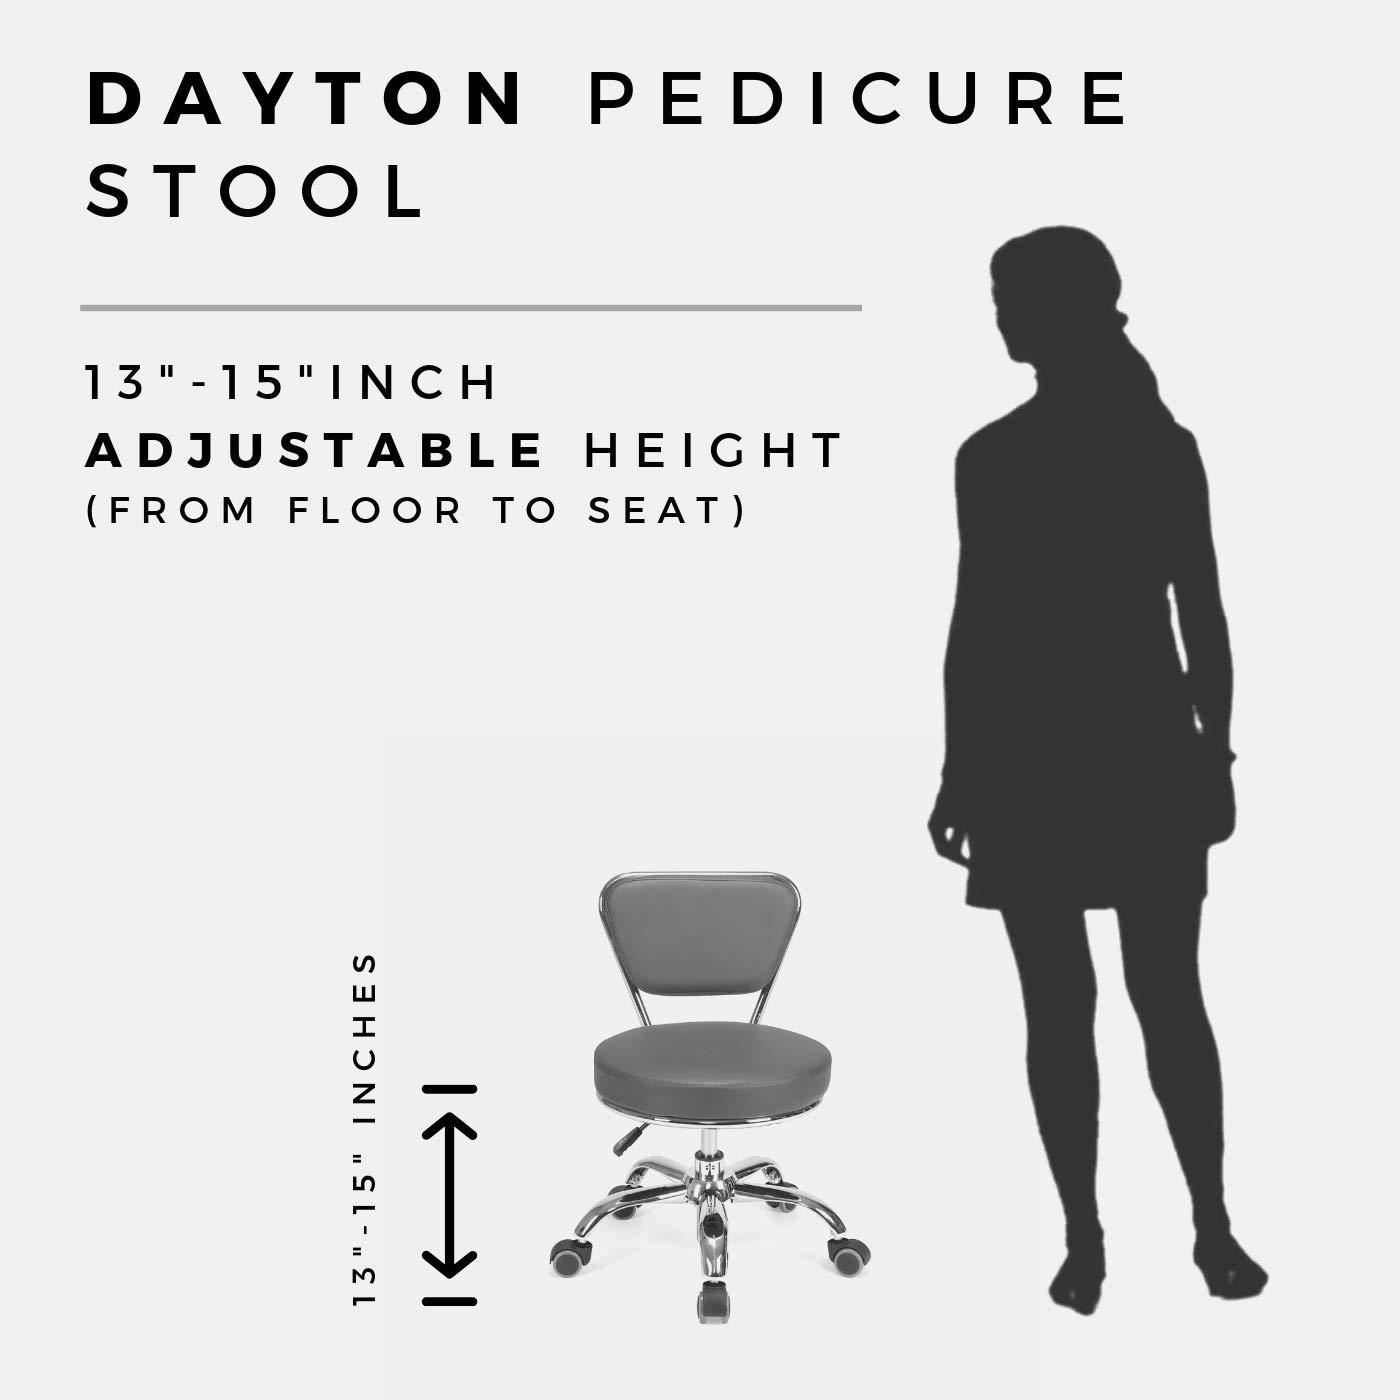 Dayton Pedicure Stool (Black) Pneumatic, Adjustable Height, Perfect for Nail Salon, Pedicure spa